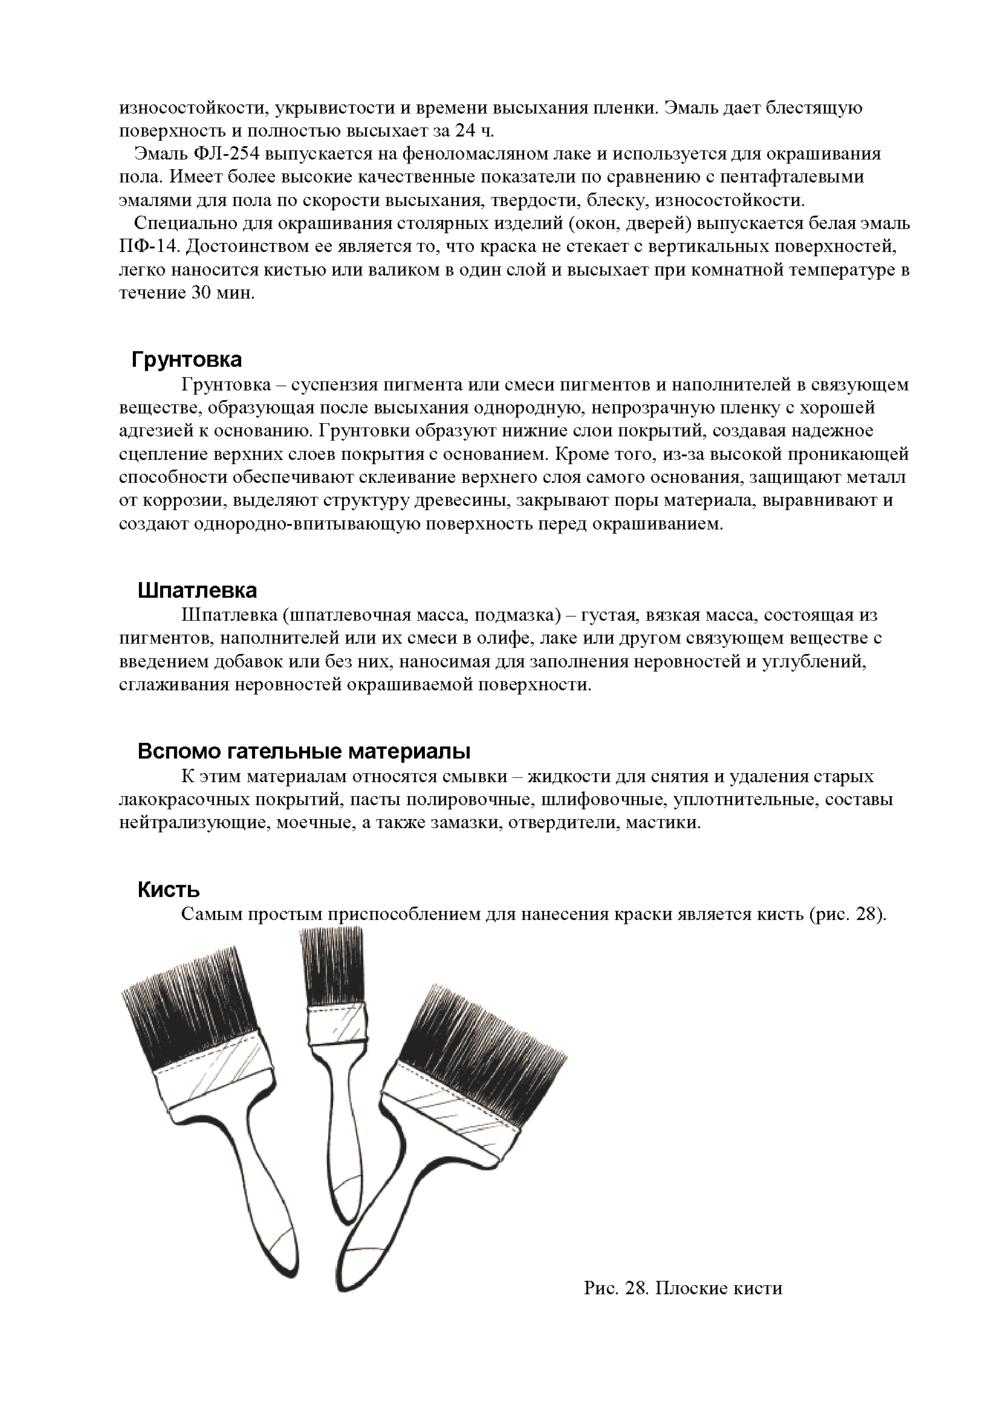 http://i1.imageban.ru/out/2013/11/26/fd5cb5b8143113fa9efc9137df7f604f.jpg